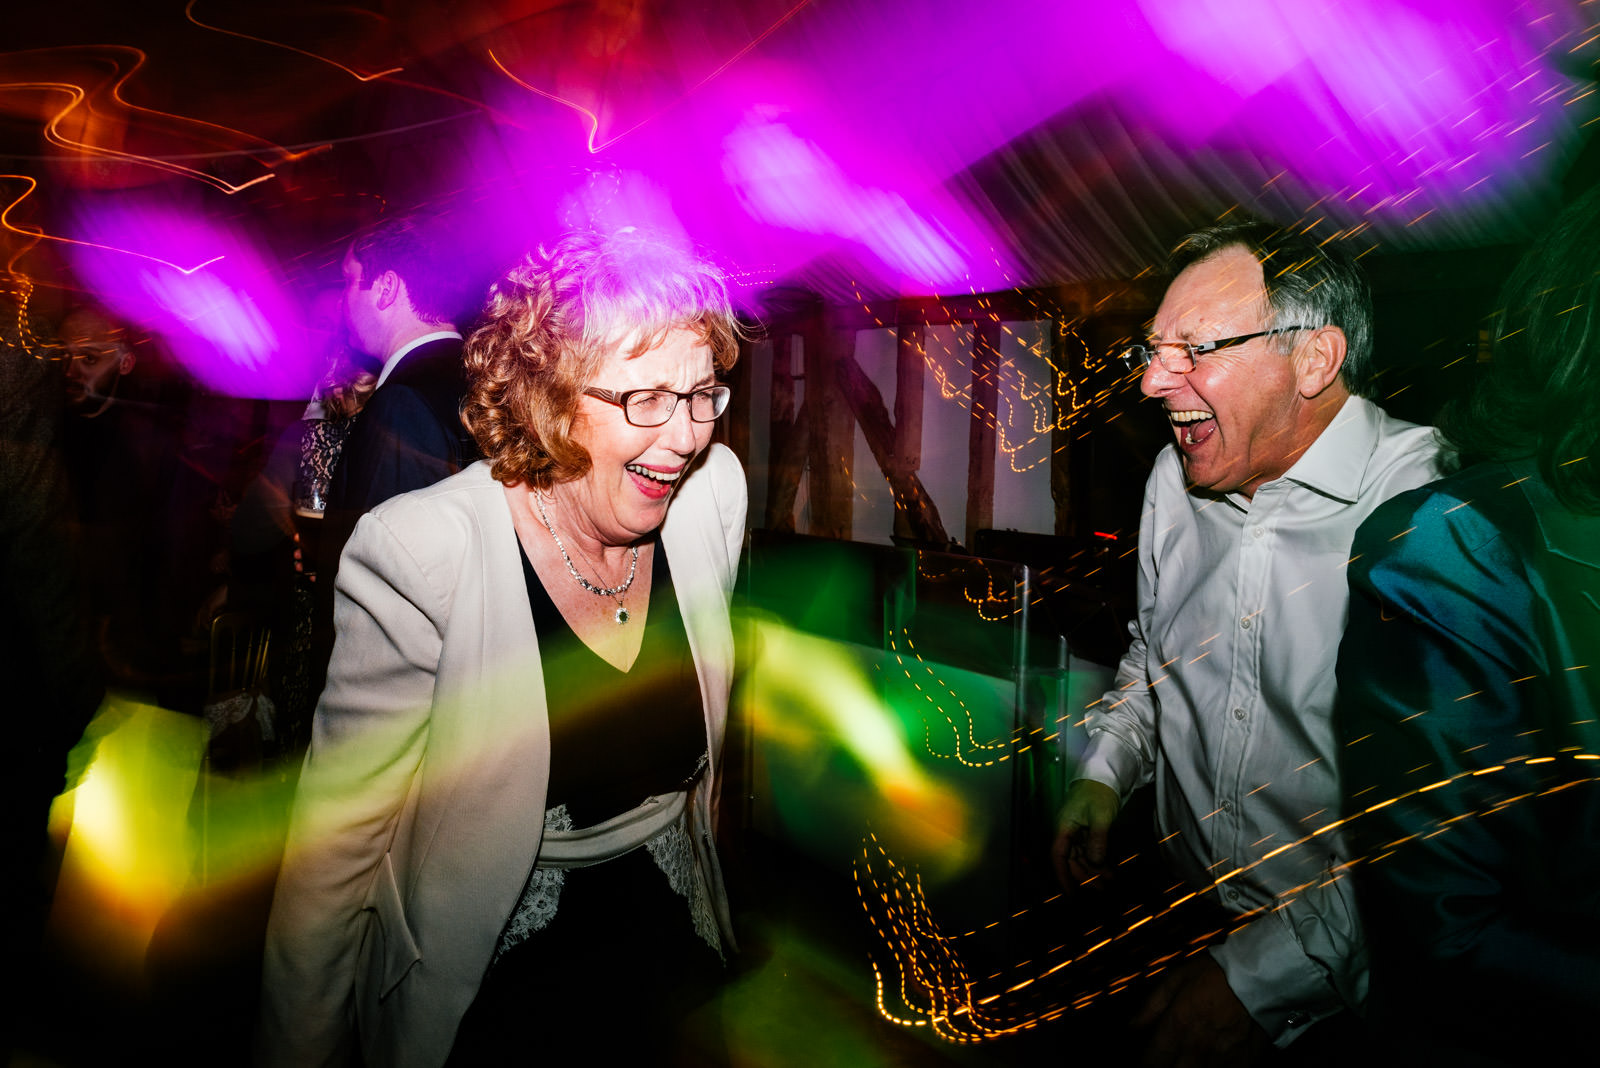 Crazy dancing on wedding day